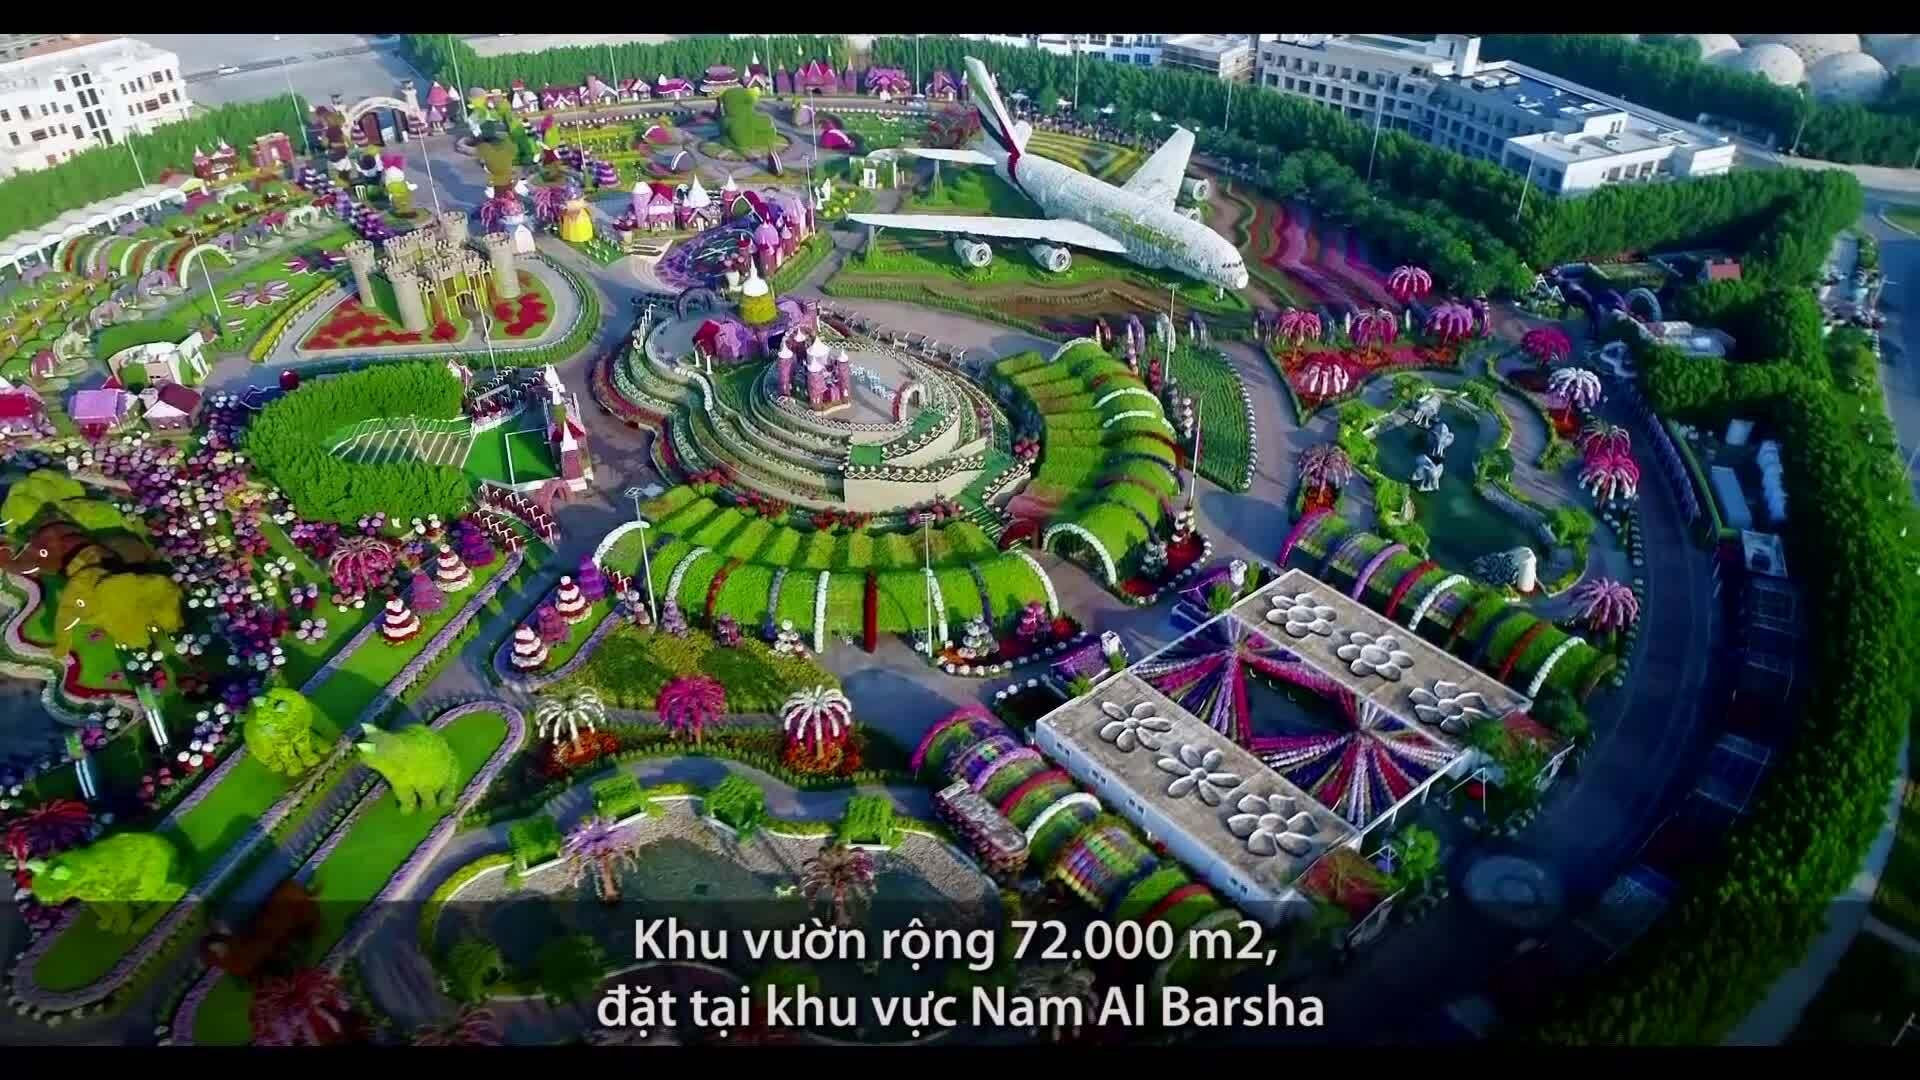 'Thế giới hoa' rộng 72.000 m2 ở Dubai